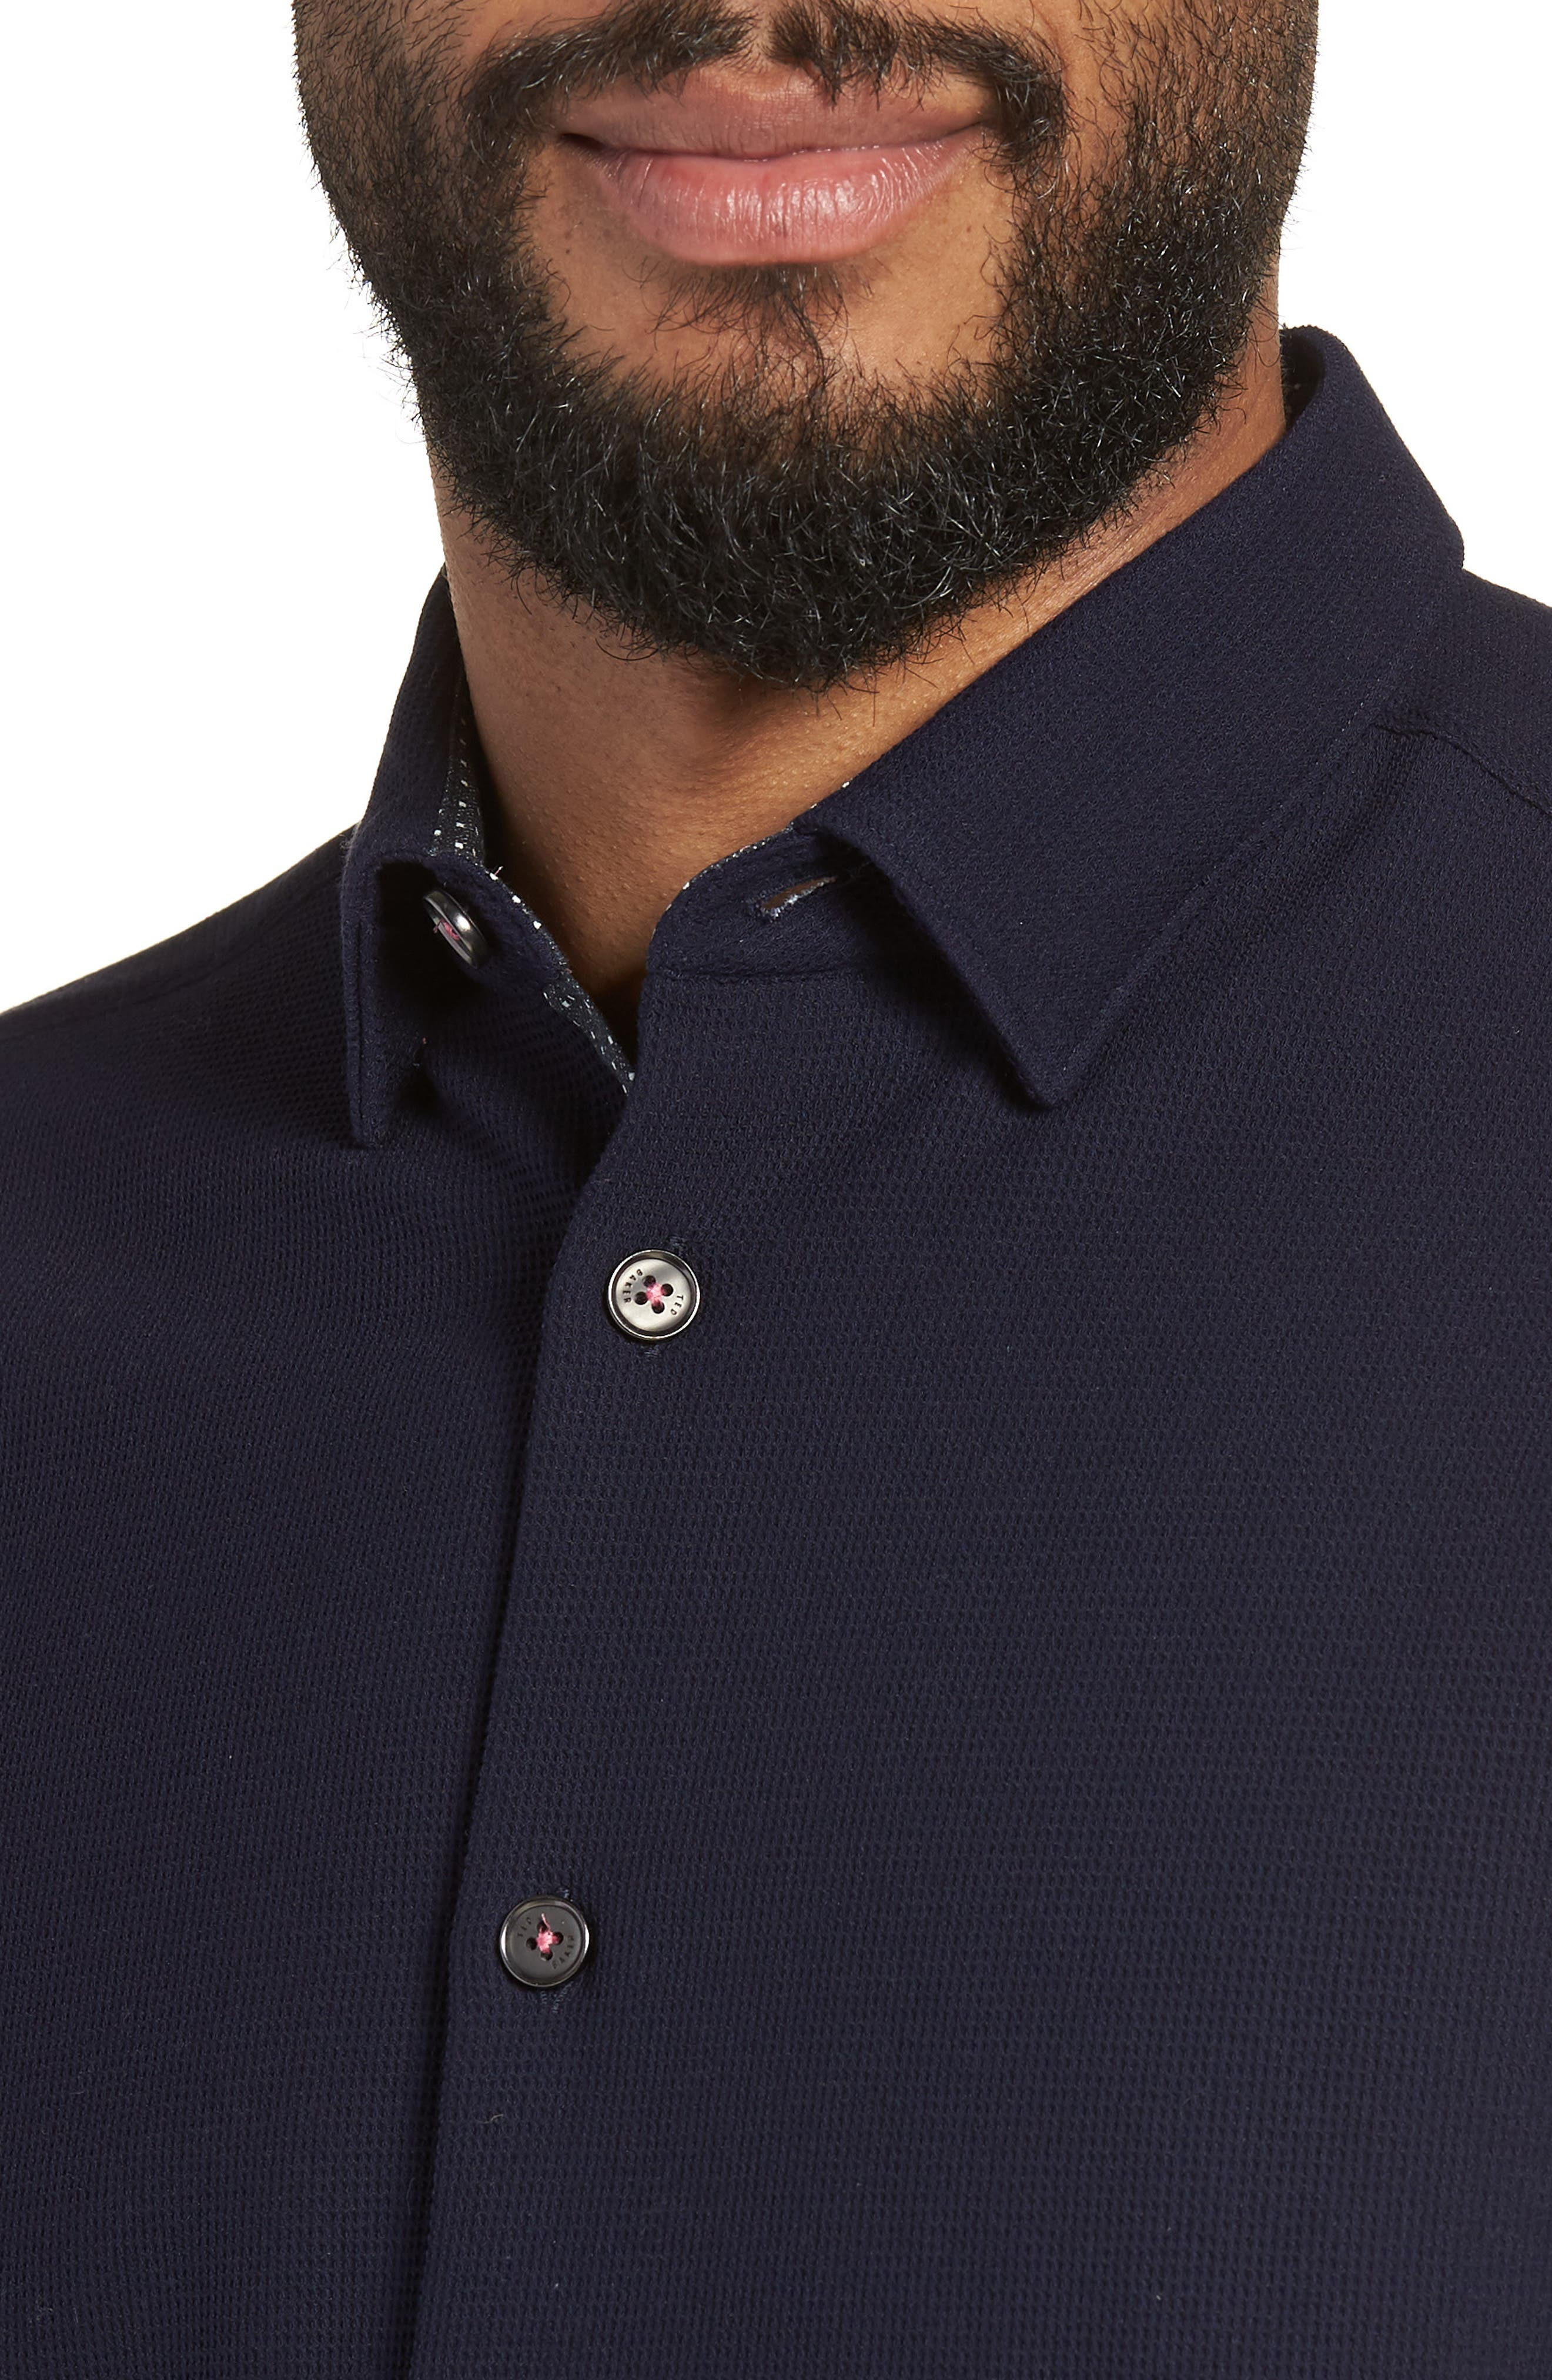 Loretax Trim Fit Stretch Knit Sport Shirt,                             Alternate thumbnail 2, color,                             Navy